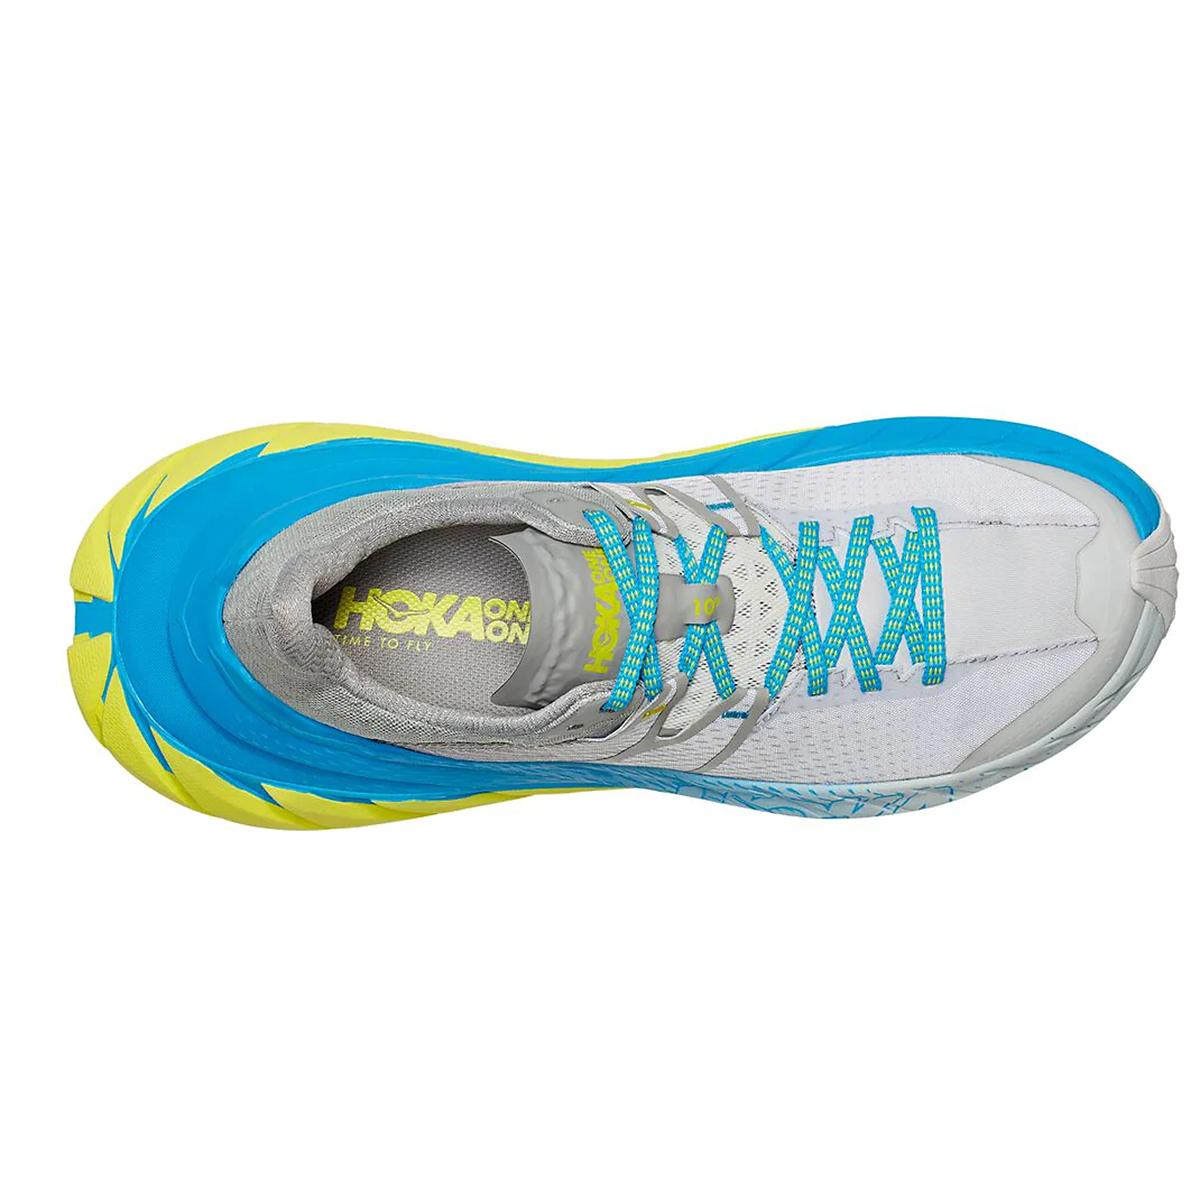 Men's Hoka One One Tennine Running Shoe - Color: Drizzle/Lunar Rock - Size: 8 - Width: Regular, Drizzle/Lunar Rock, large, image 3